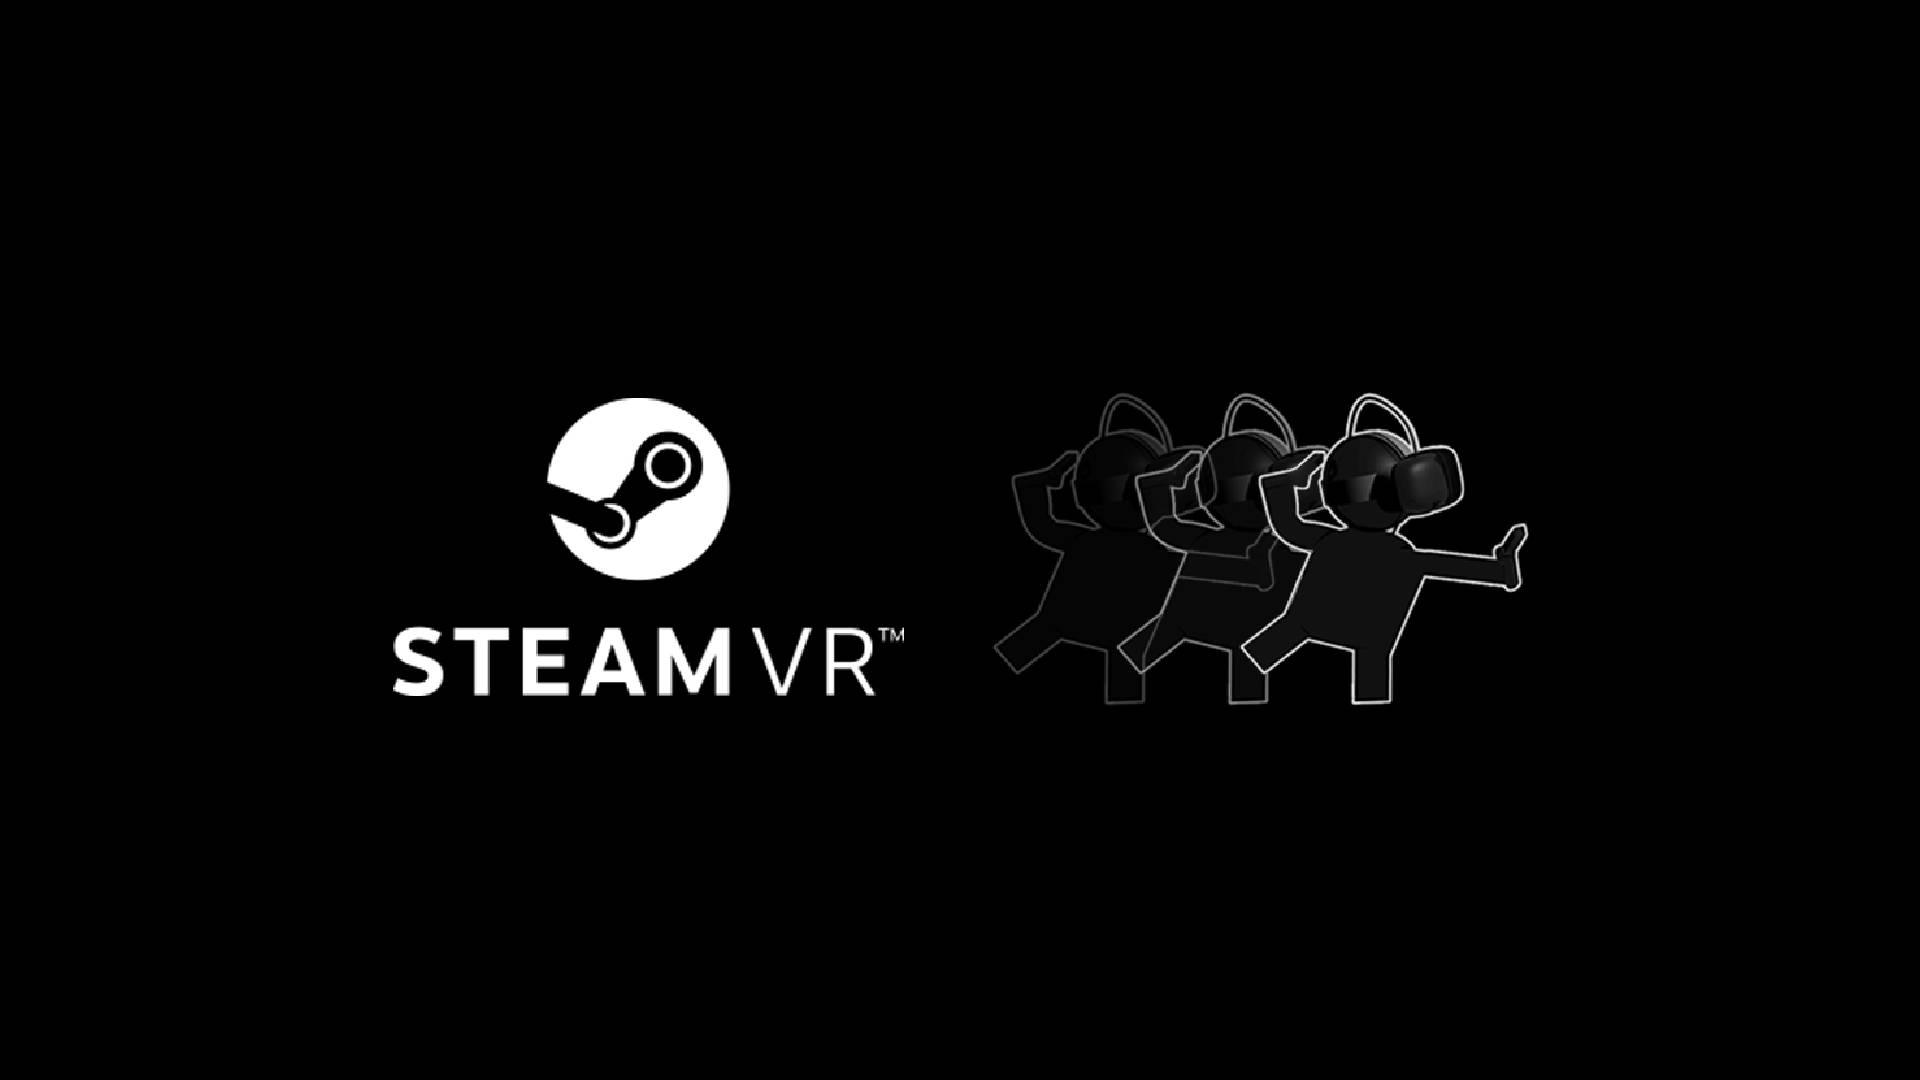 SteamVR logo